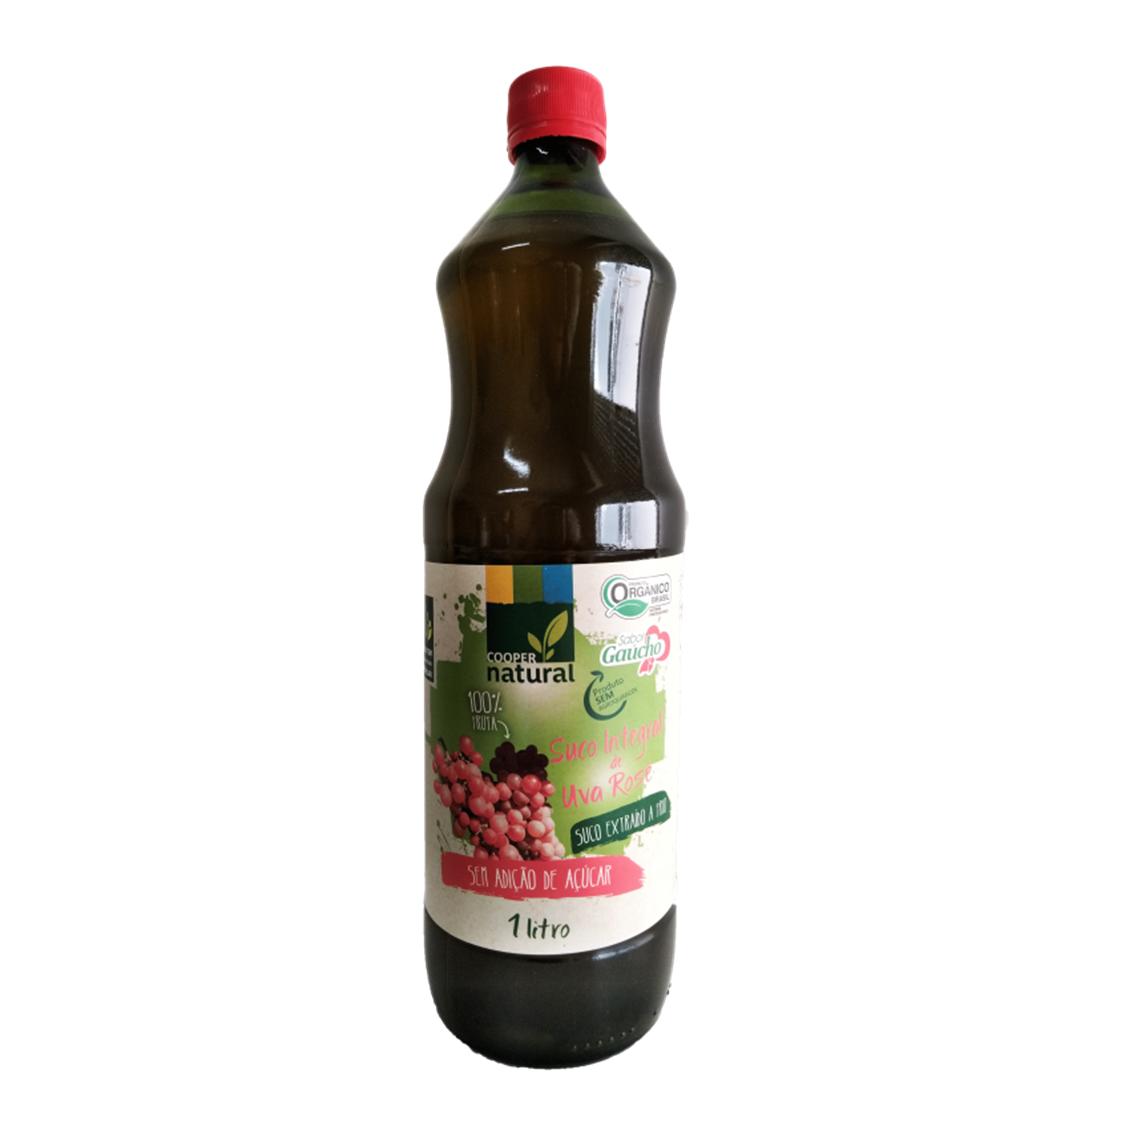 Suco de Uva Rosé (1L) – Coopernatural